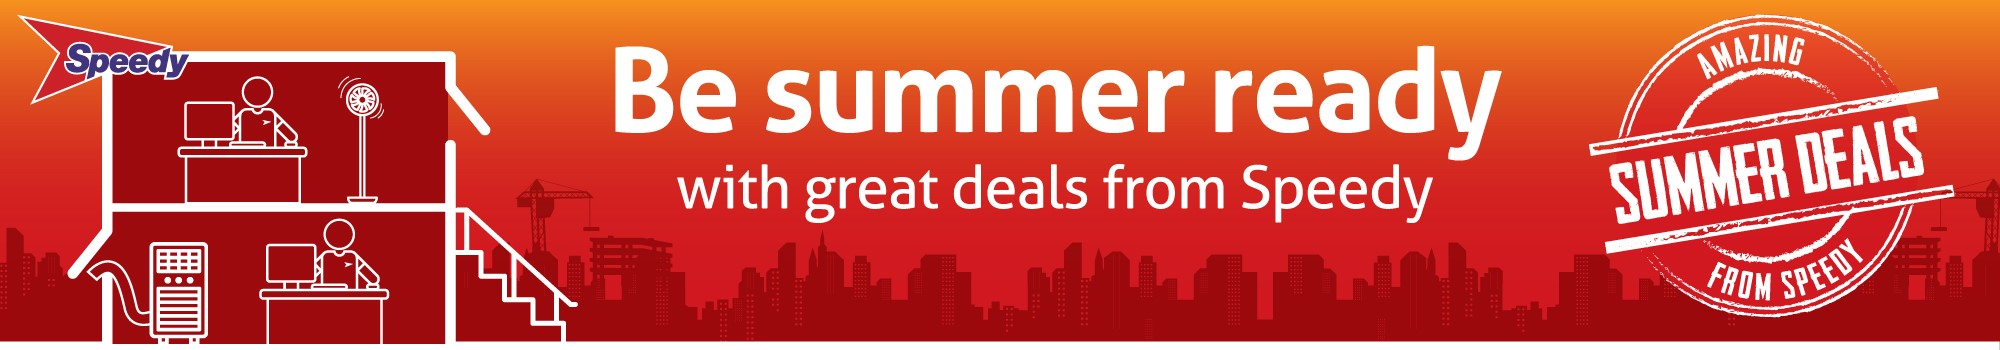 summer deal landing page header.jpg